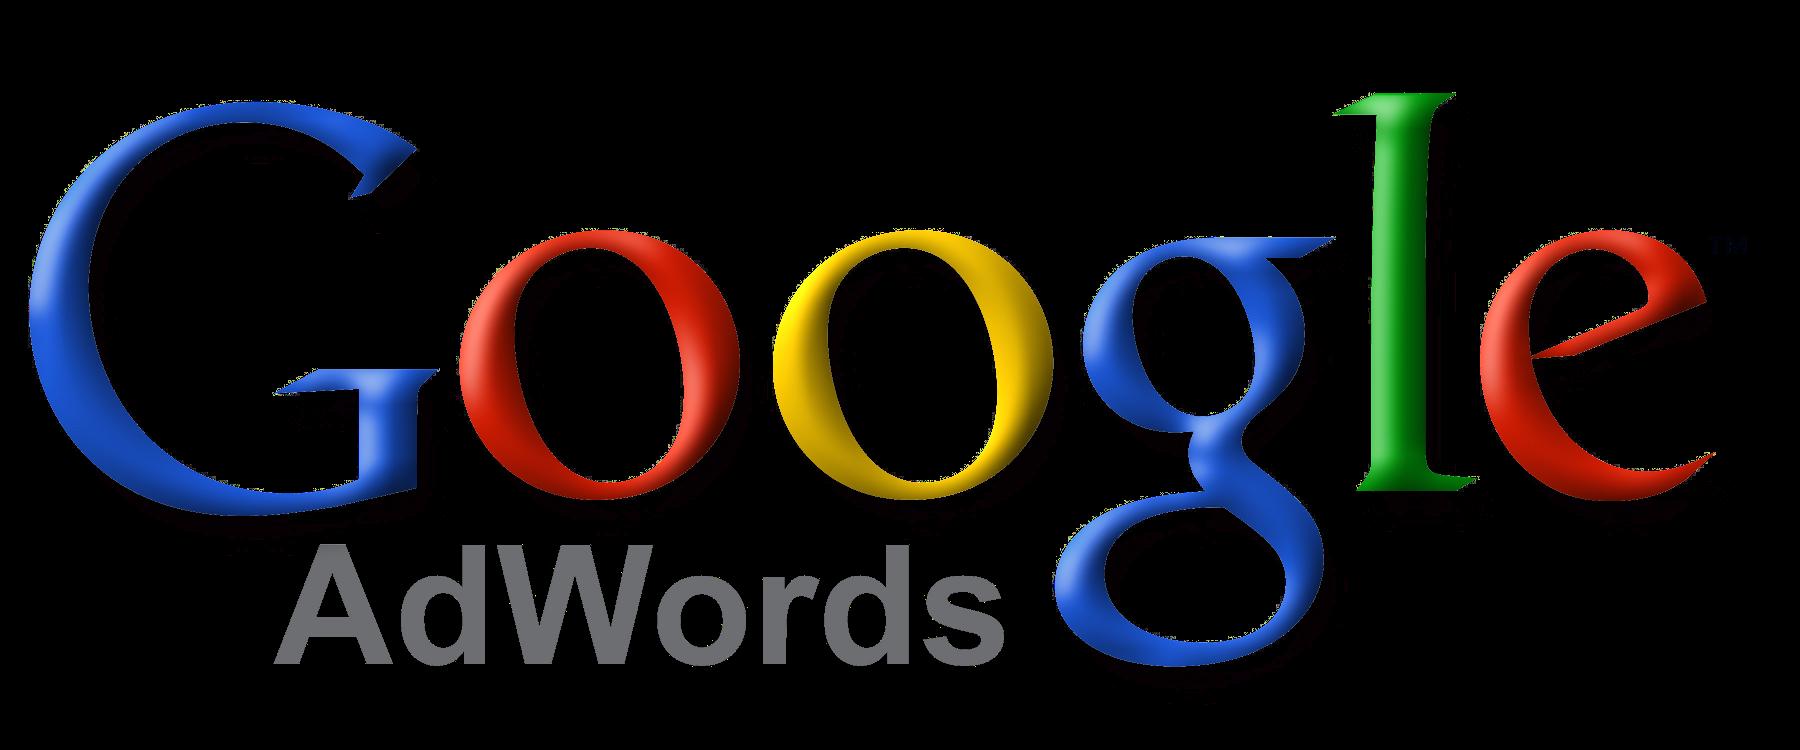 File:Logo-google-adwords.png - Google Adwords Logo PNG